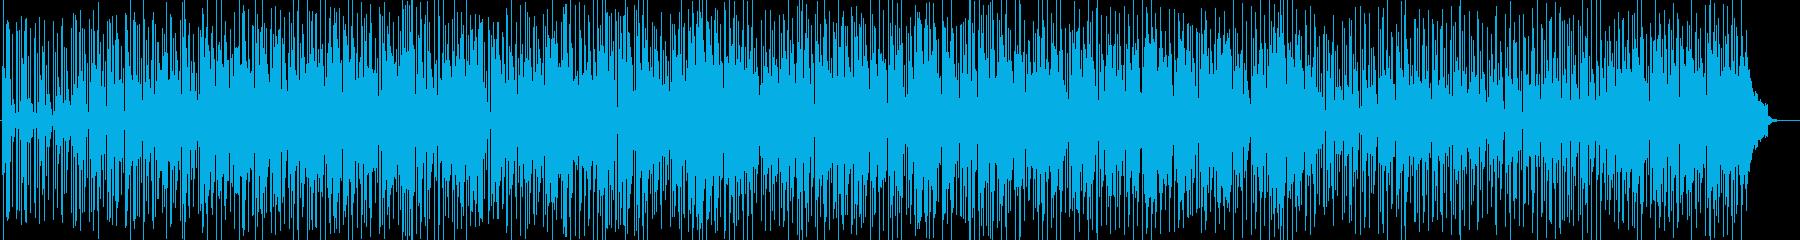 SAXとエレピの暖かで優しいフュージョンの再生済みの波形